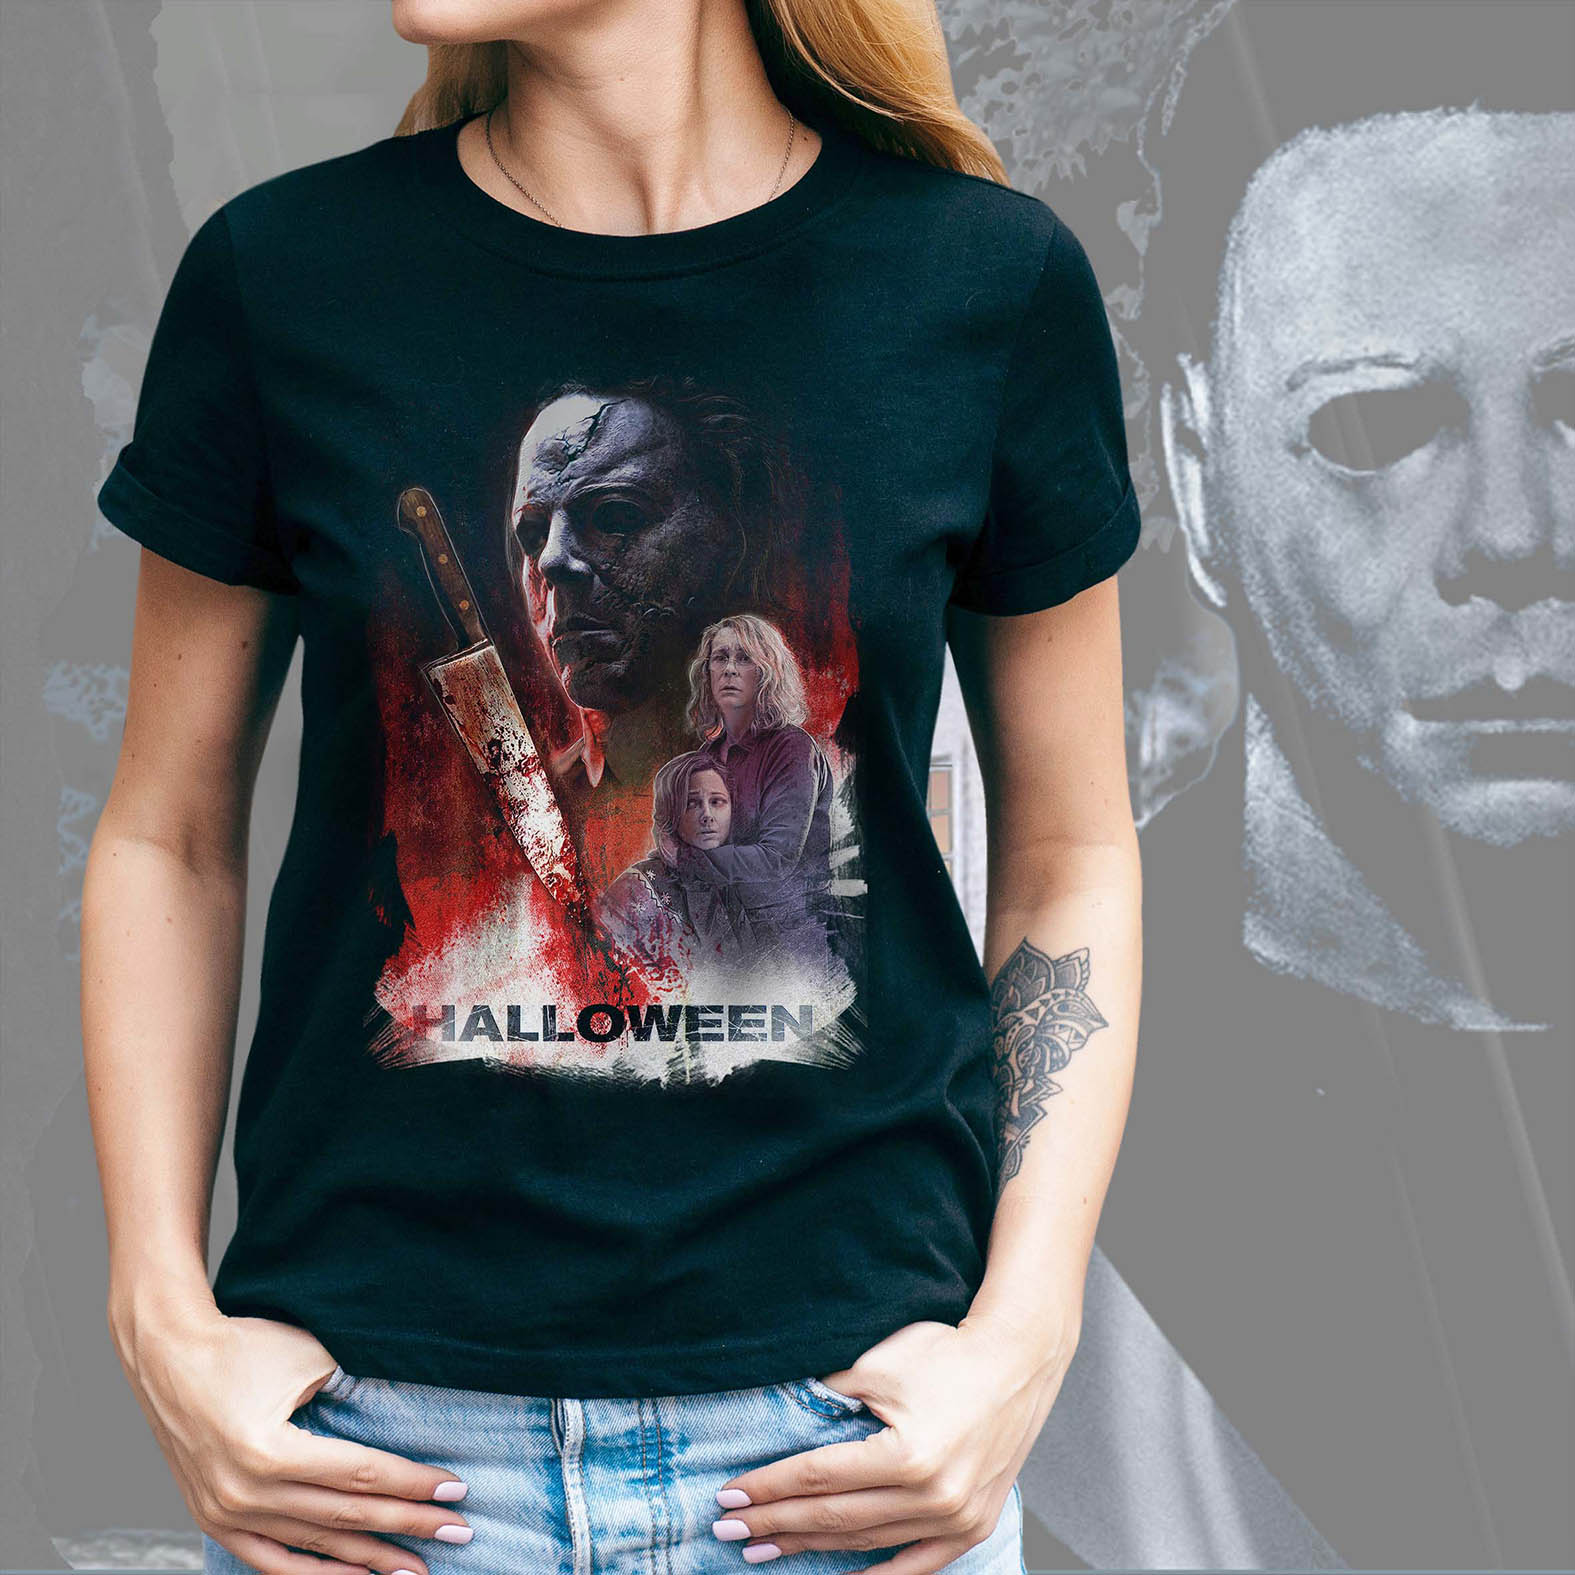 Camiseta Feminina Unissex Michael Myers Halloween Terror Horror Serial Killer (Preta) - EV